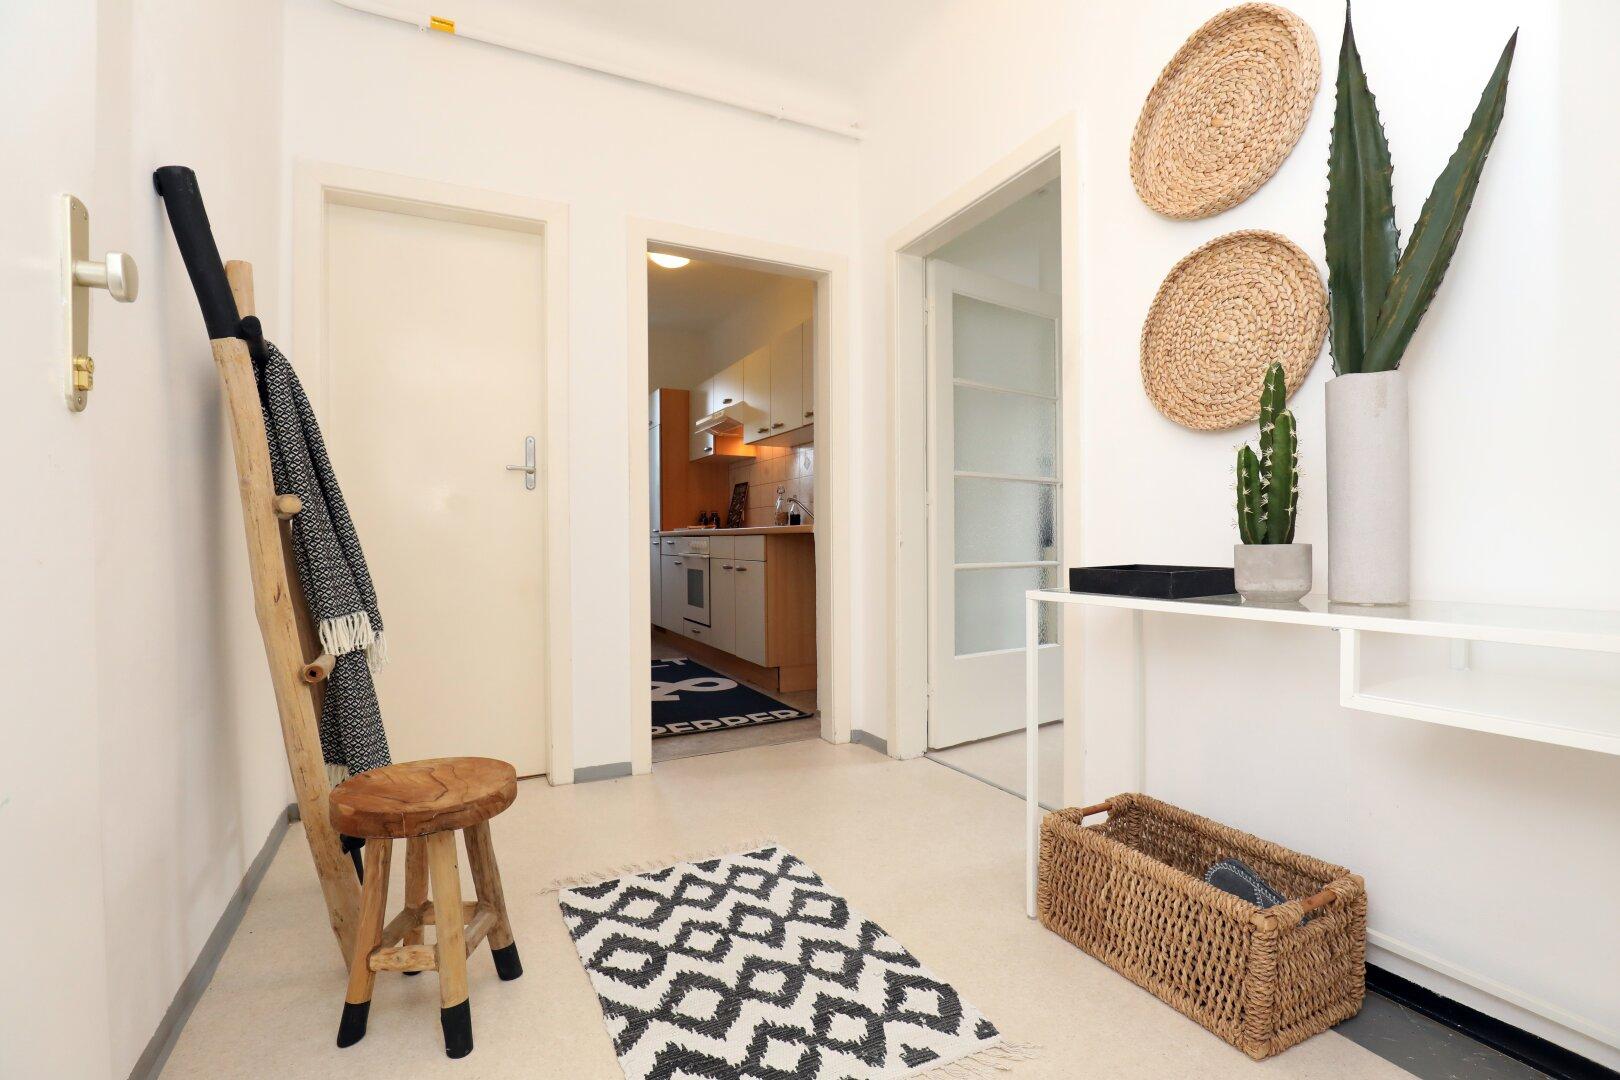 Wohnung in Ruhelage